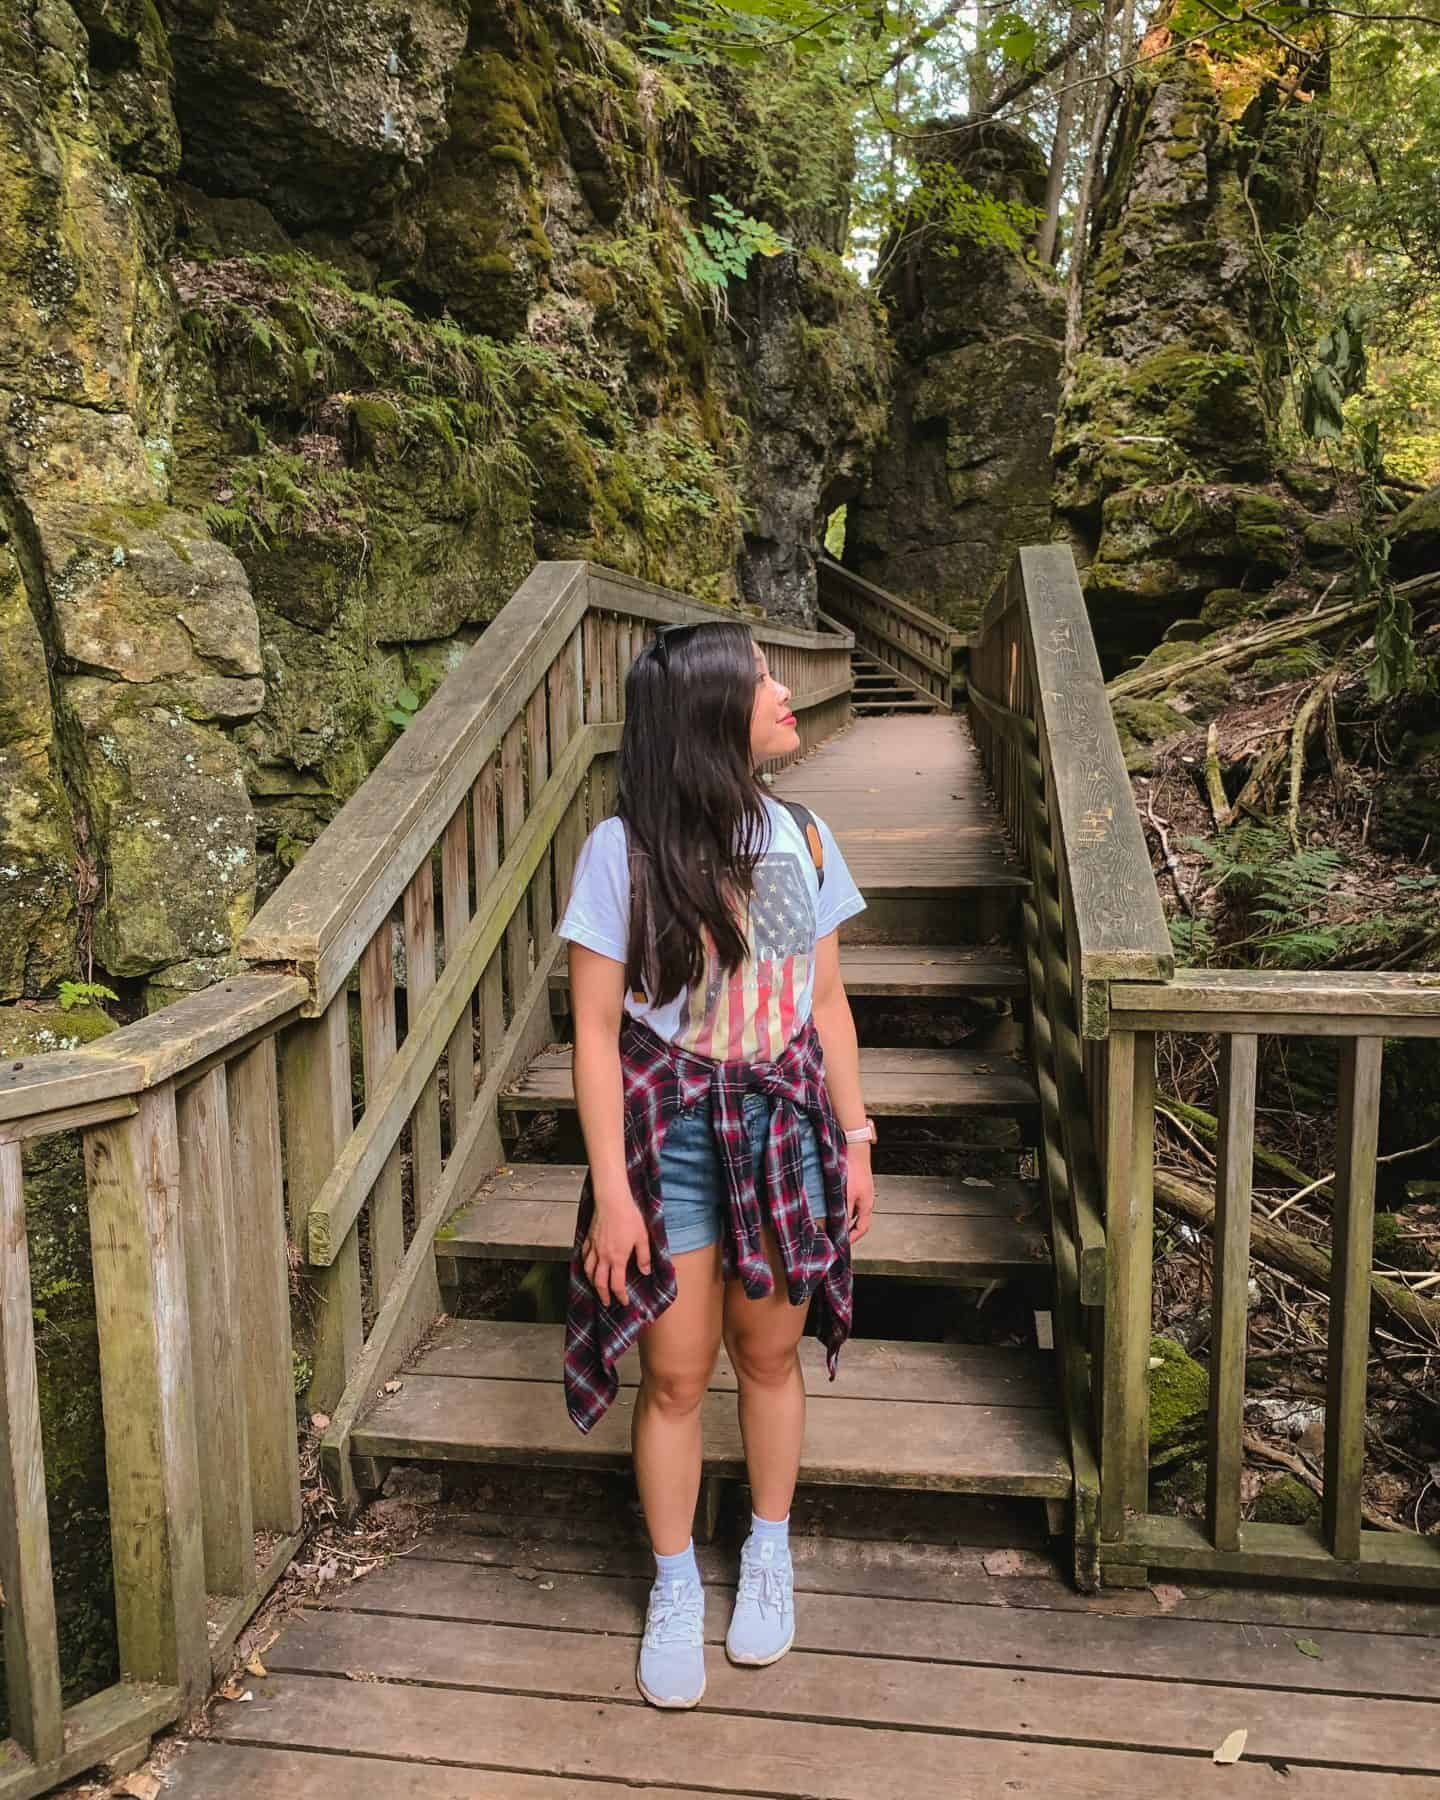 Hike at Mono Cliffs Provincial Park in Orangeville, Ontario